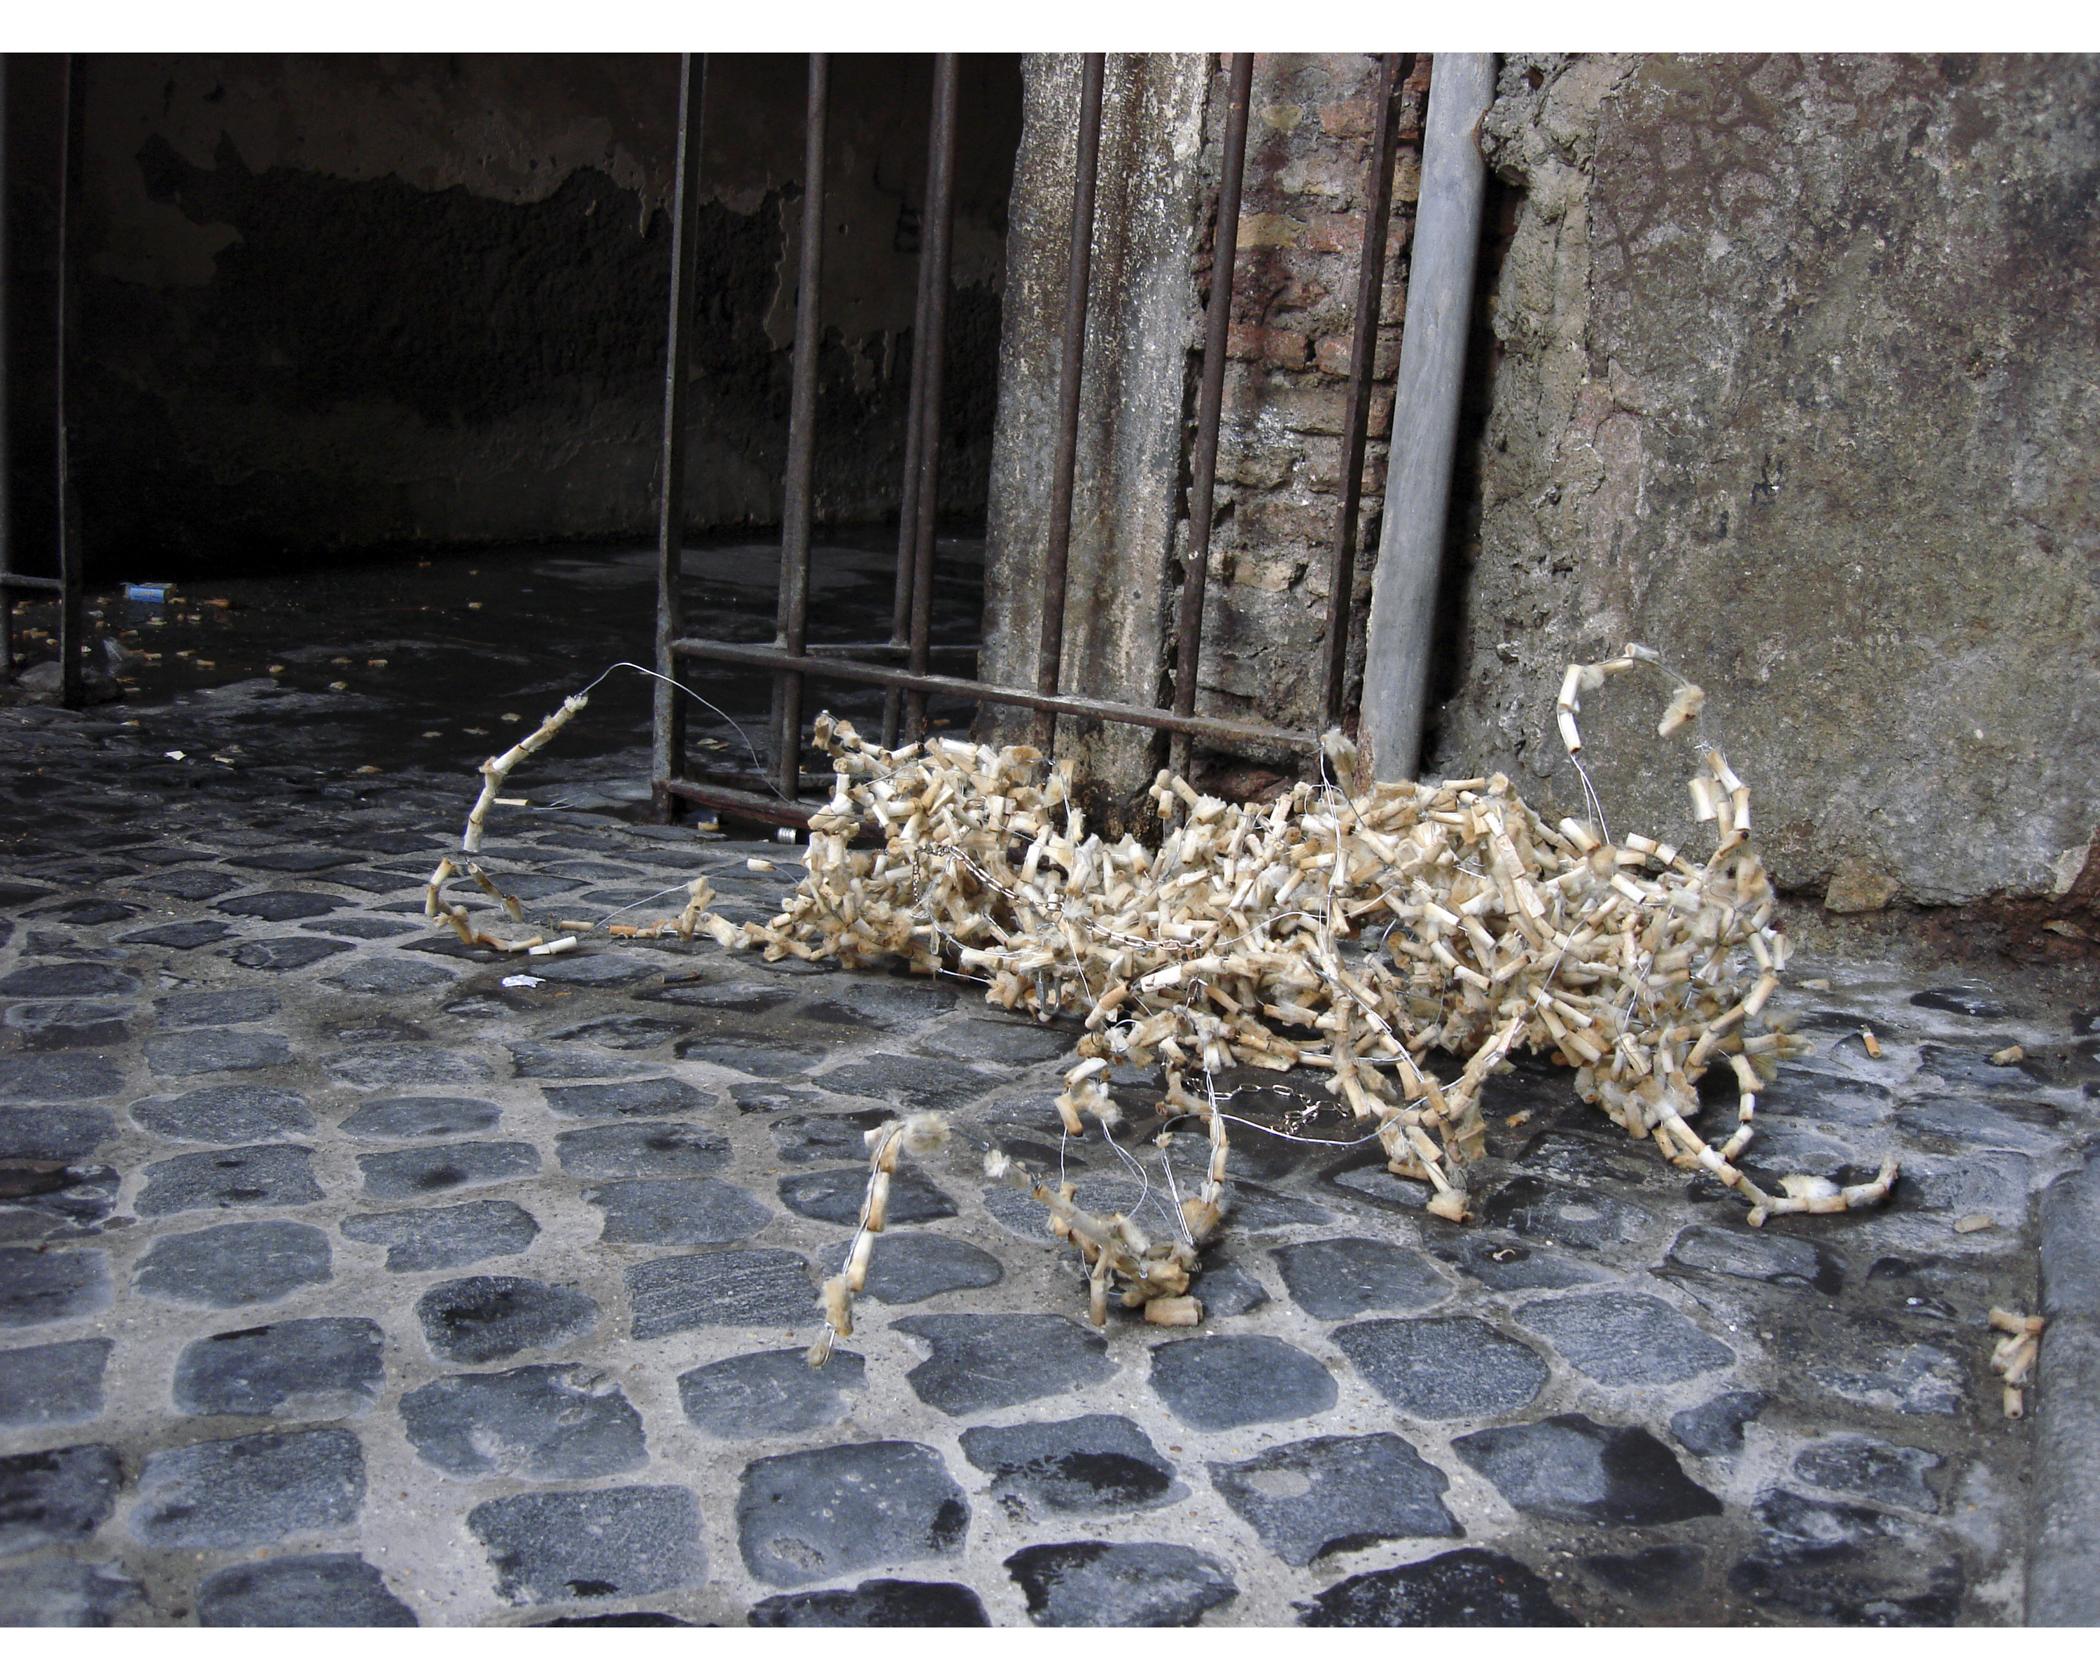 Carcass (urban intervention)